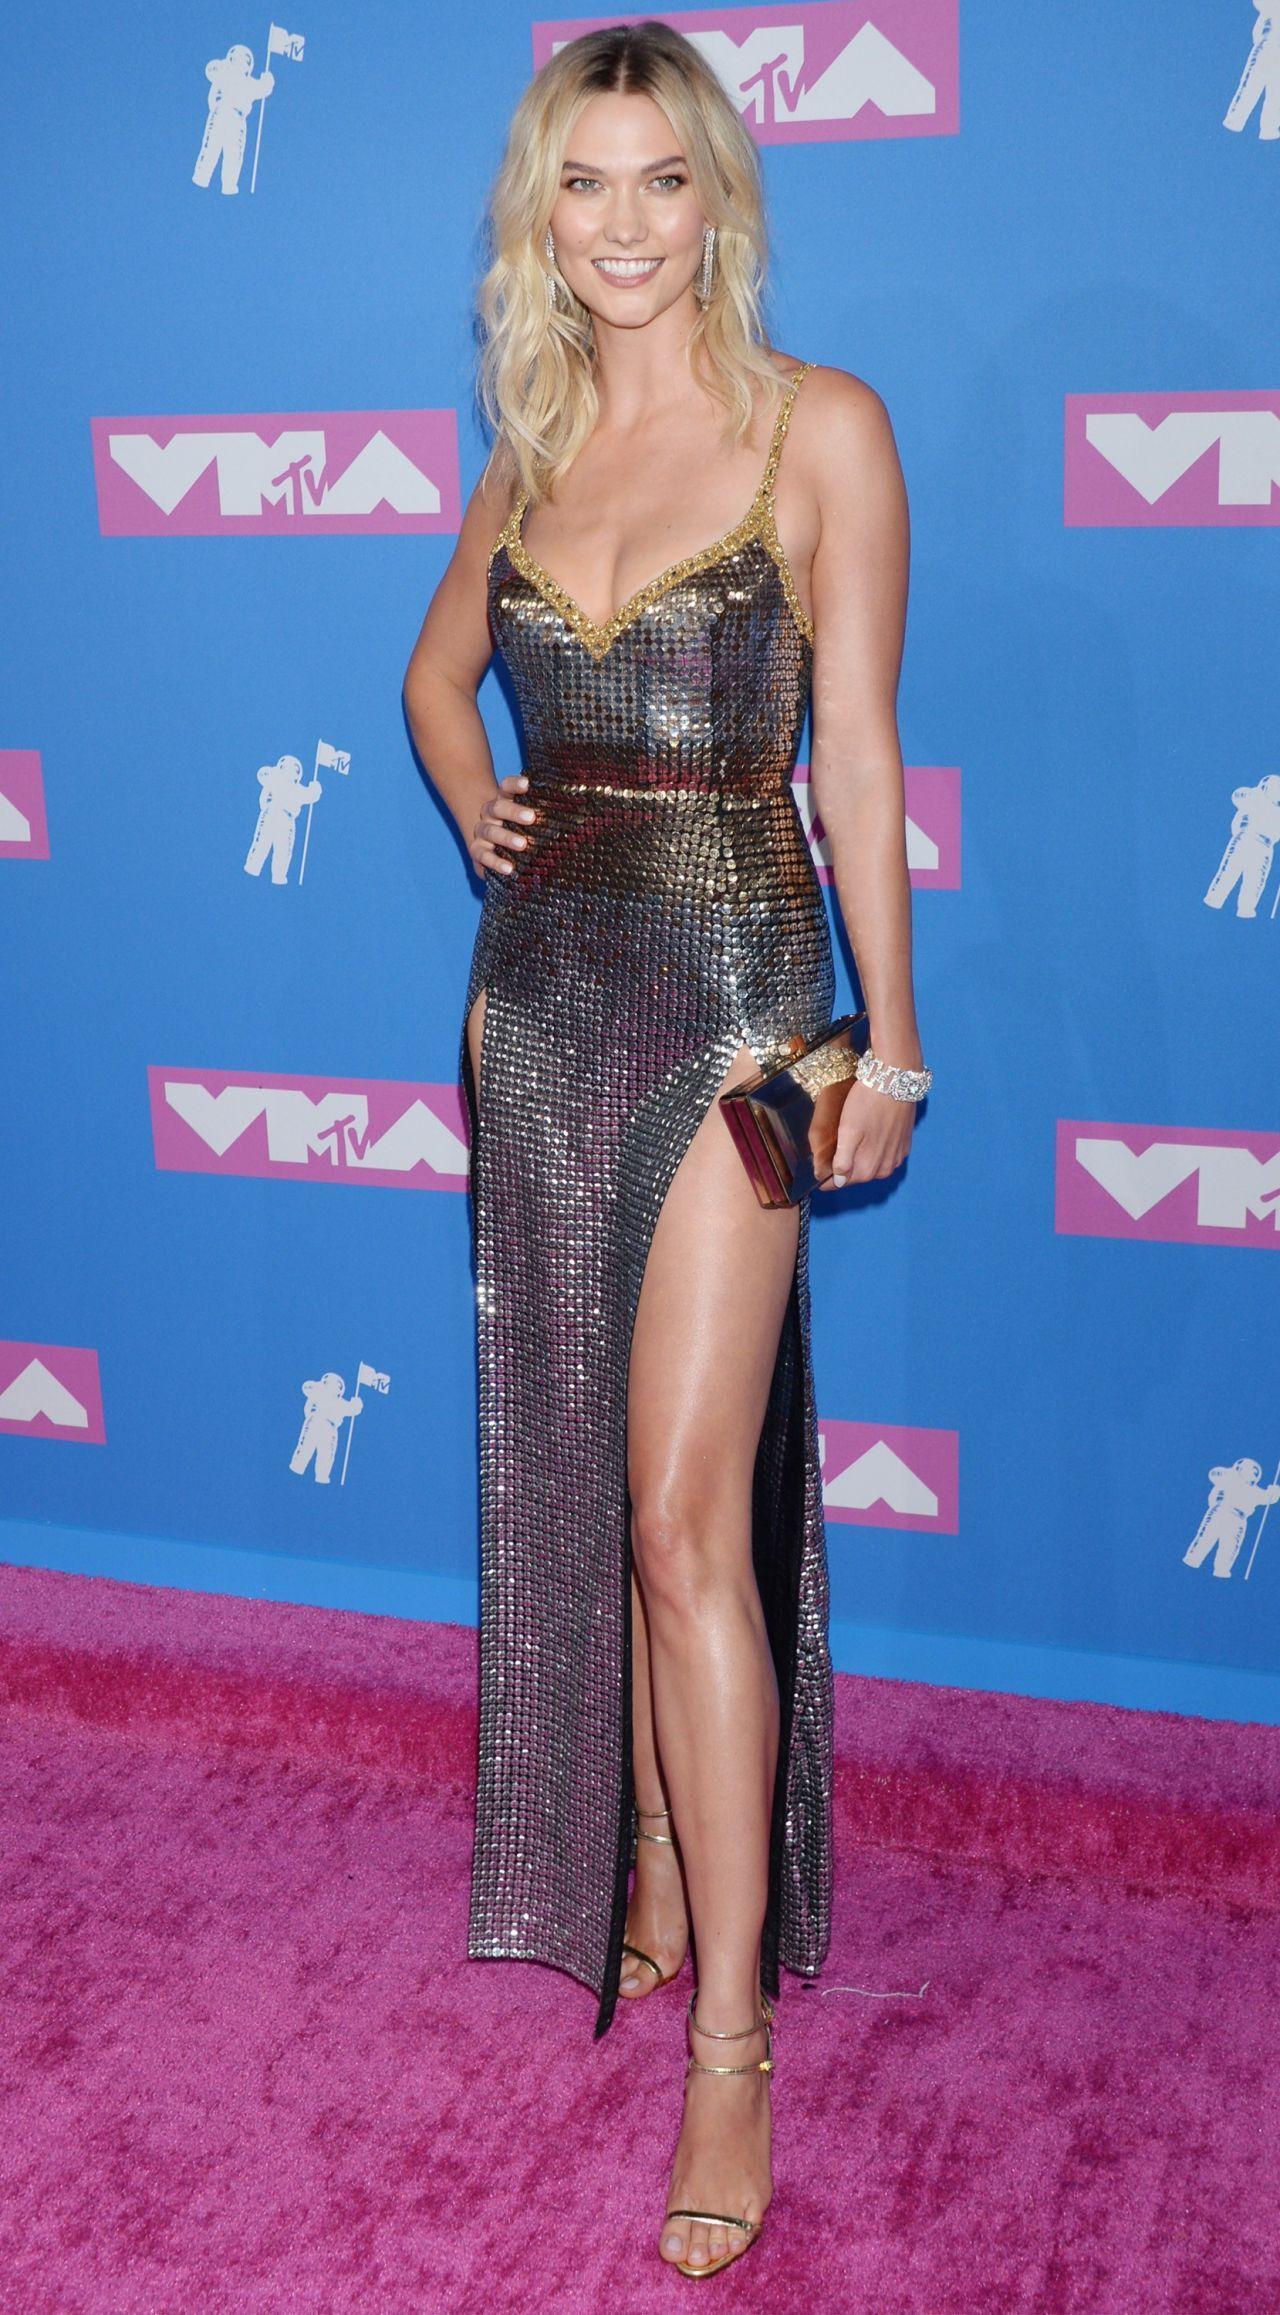 Video Karlie Kloss nude (69 foto and video), Pussy, Bikini, Selfie, legs 2020